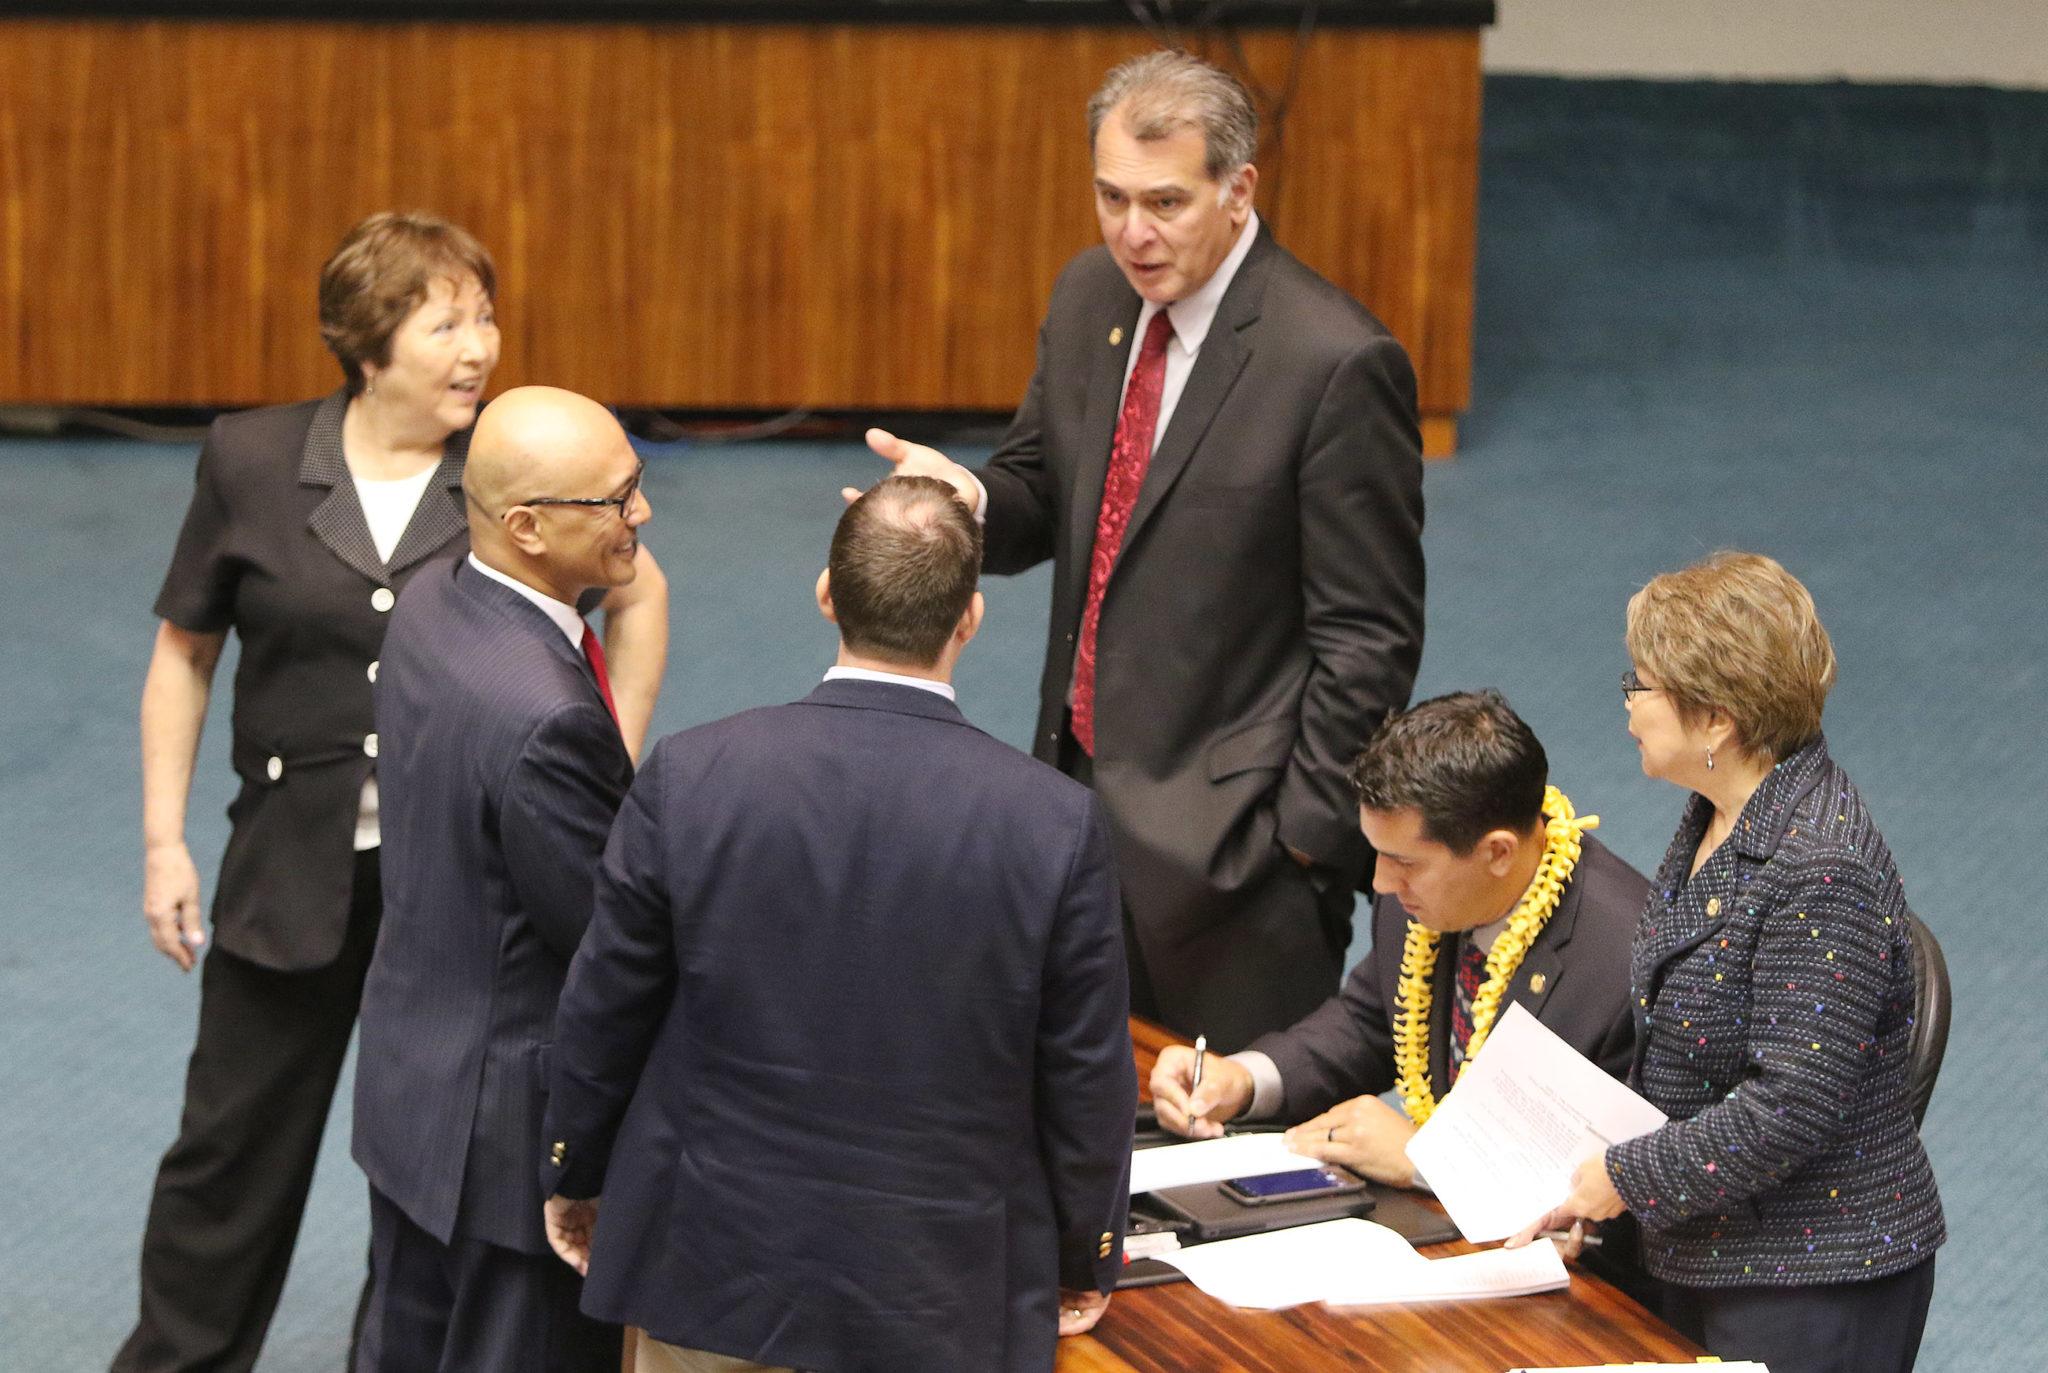 Senators before Lunch break. 2 may 2017